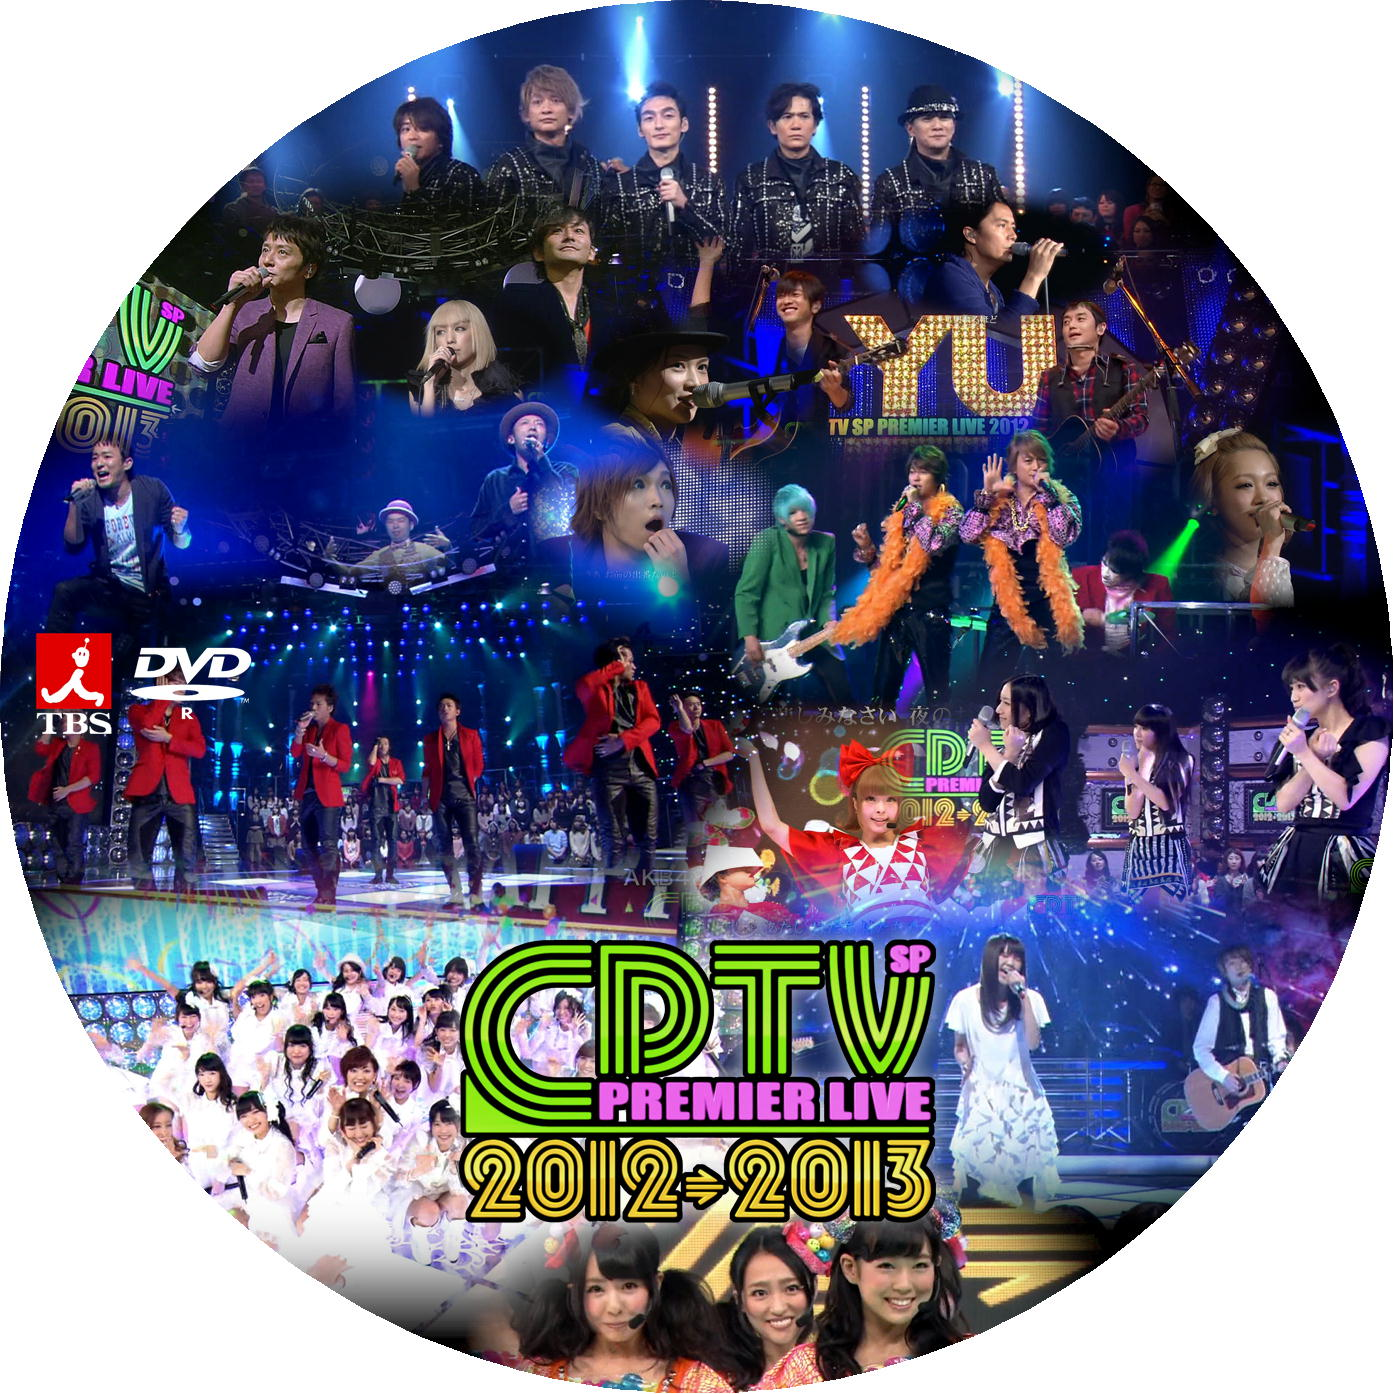 CDTV PREMIER LIVE 2012-2013 DVDラベル